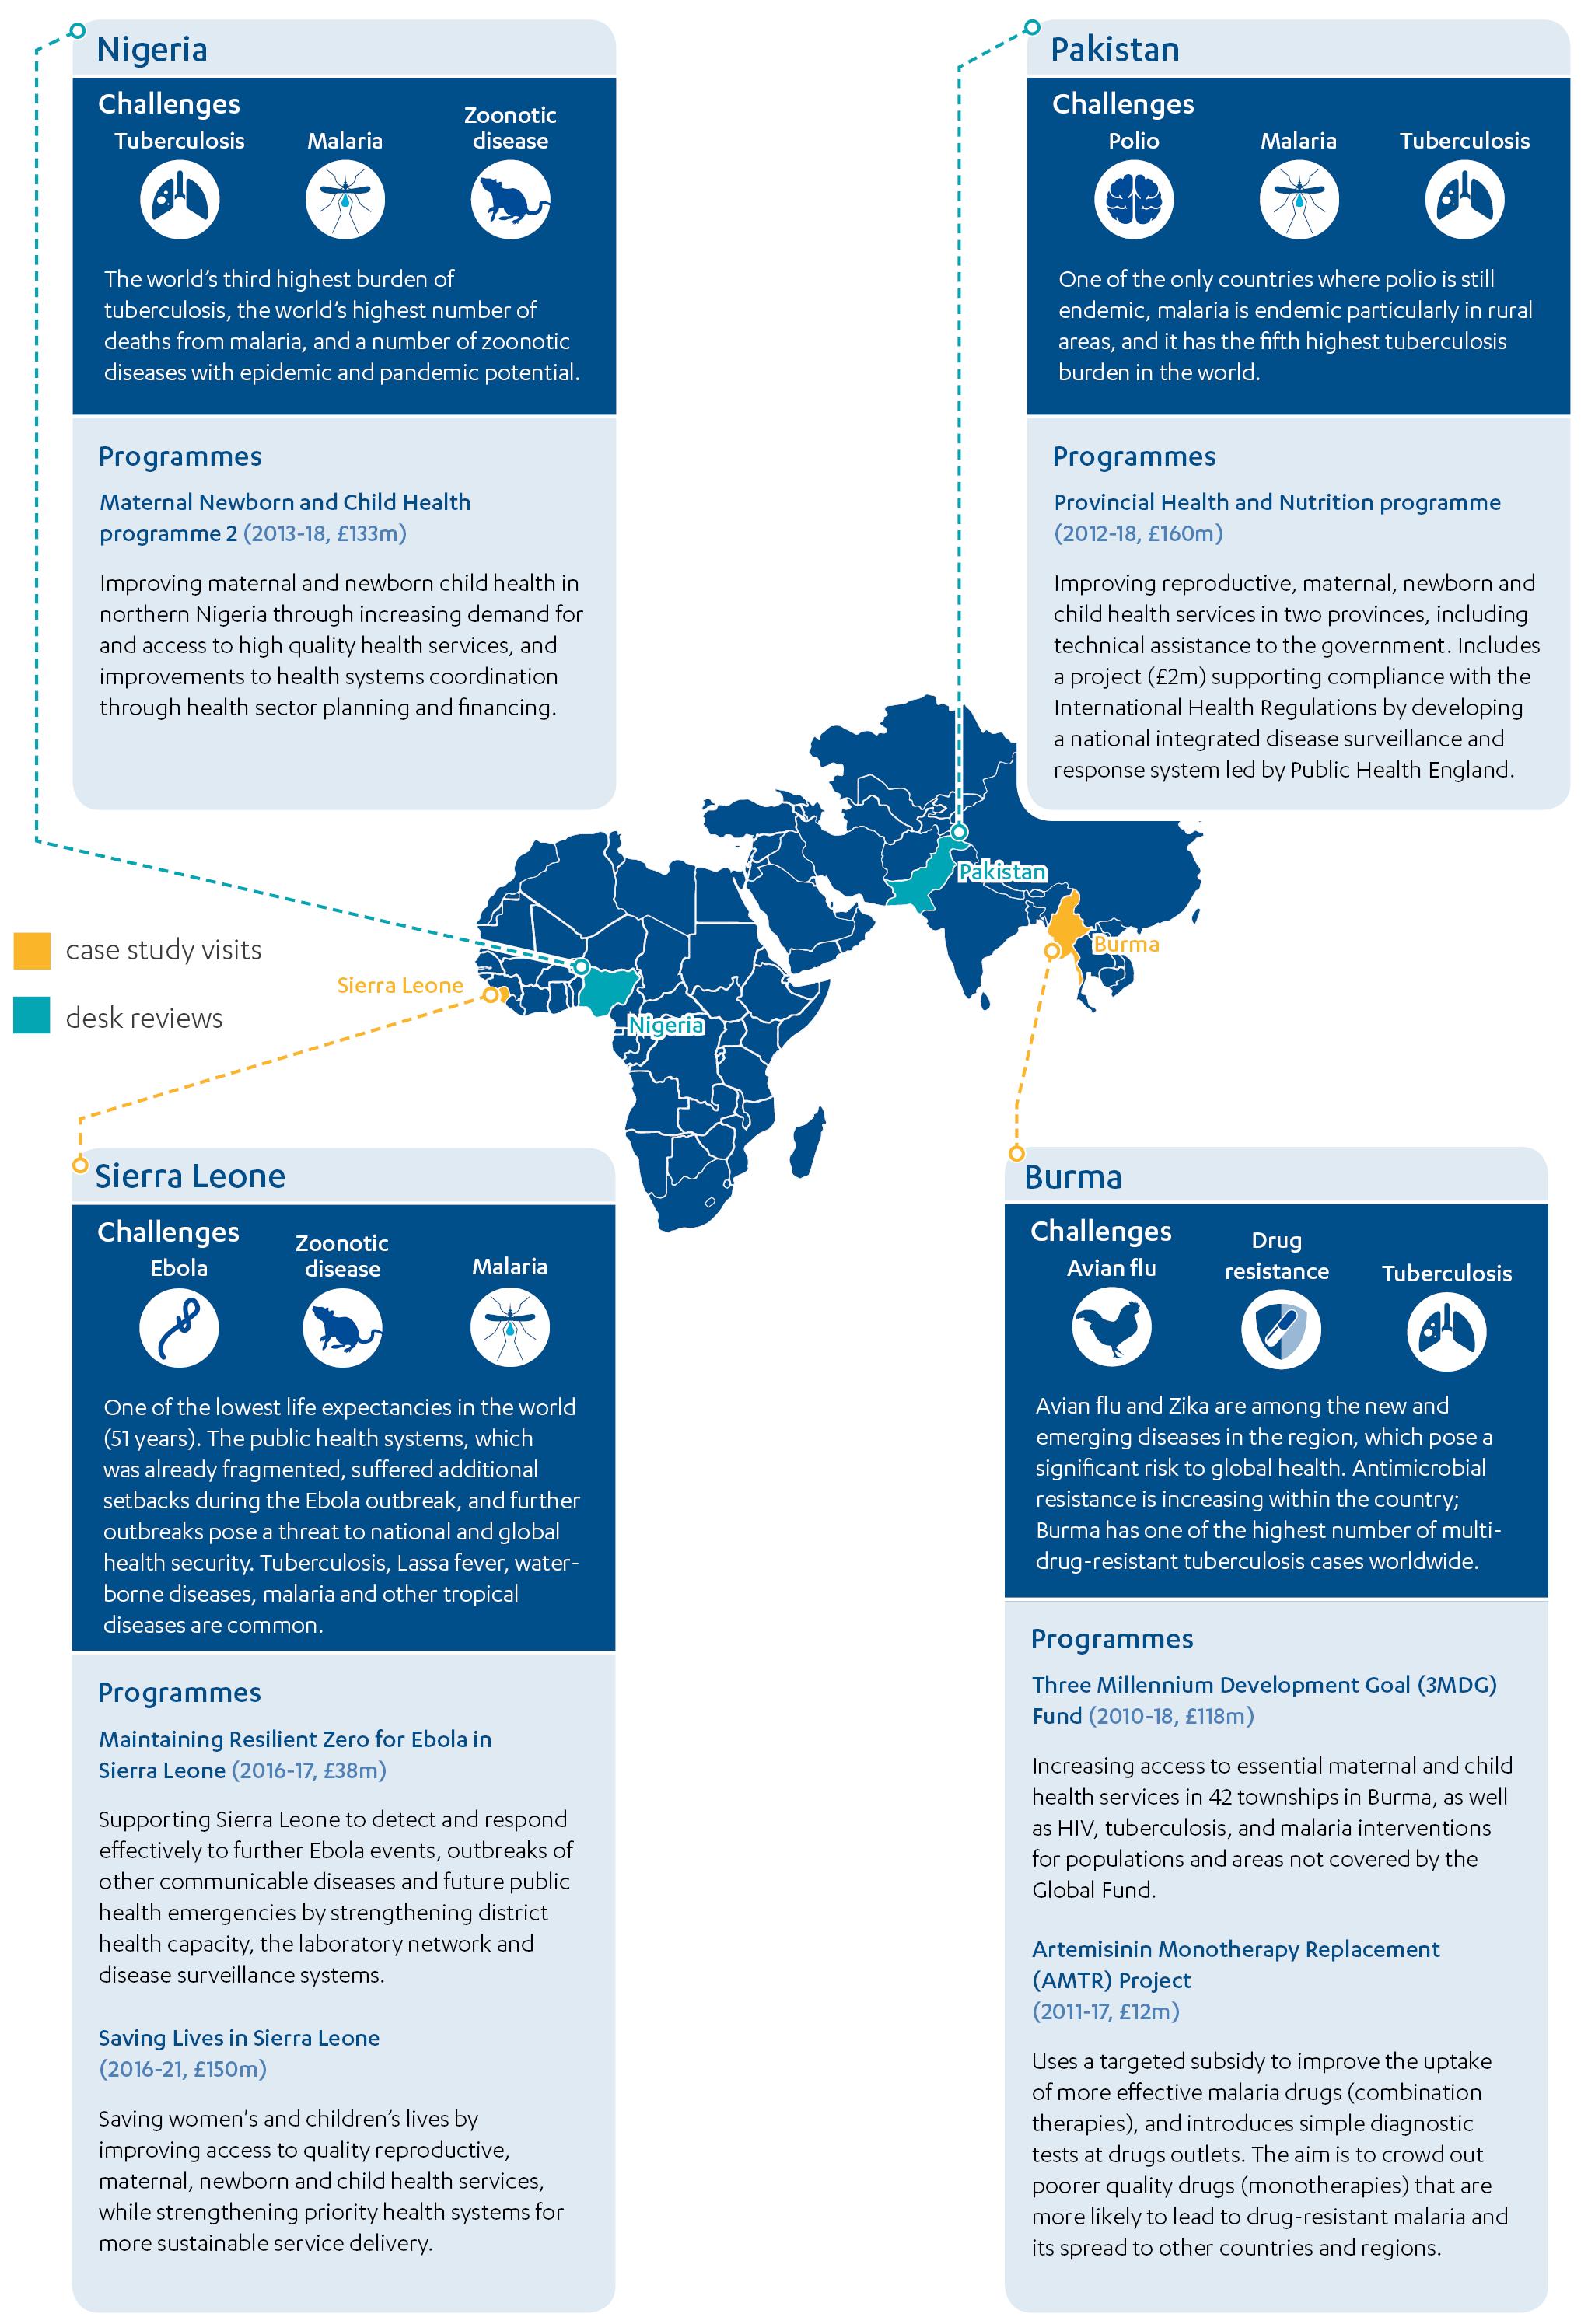 Map showing country case studies: Nigeria, Pakistan, Burma and Sierra Leone.